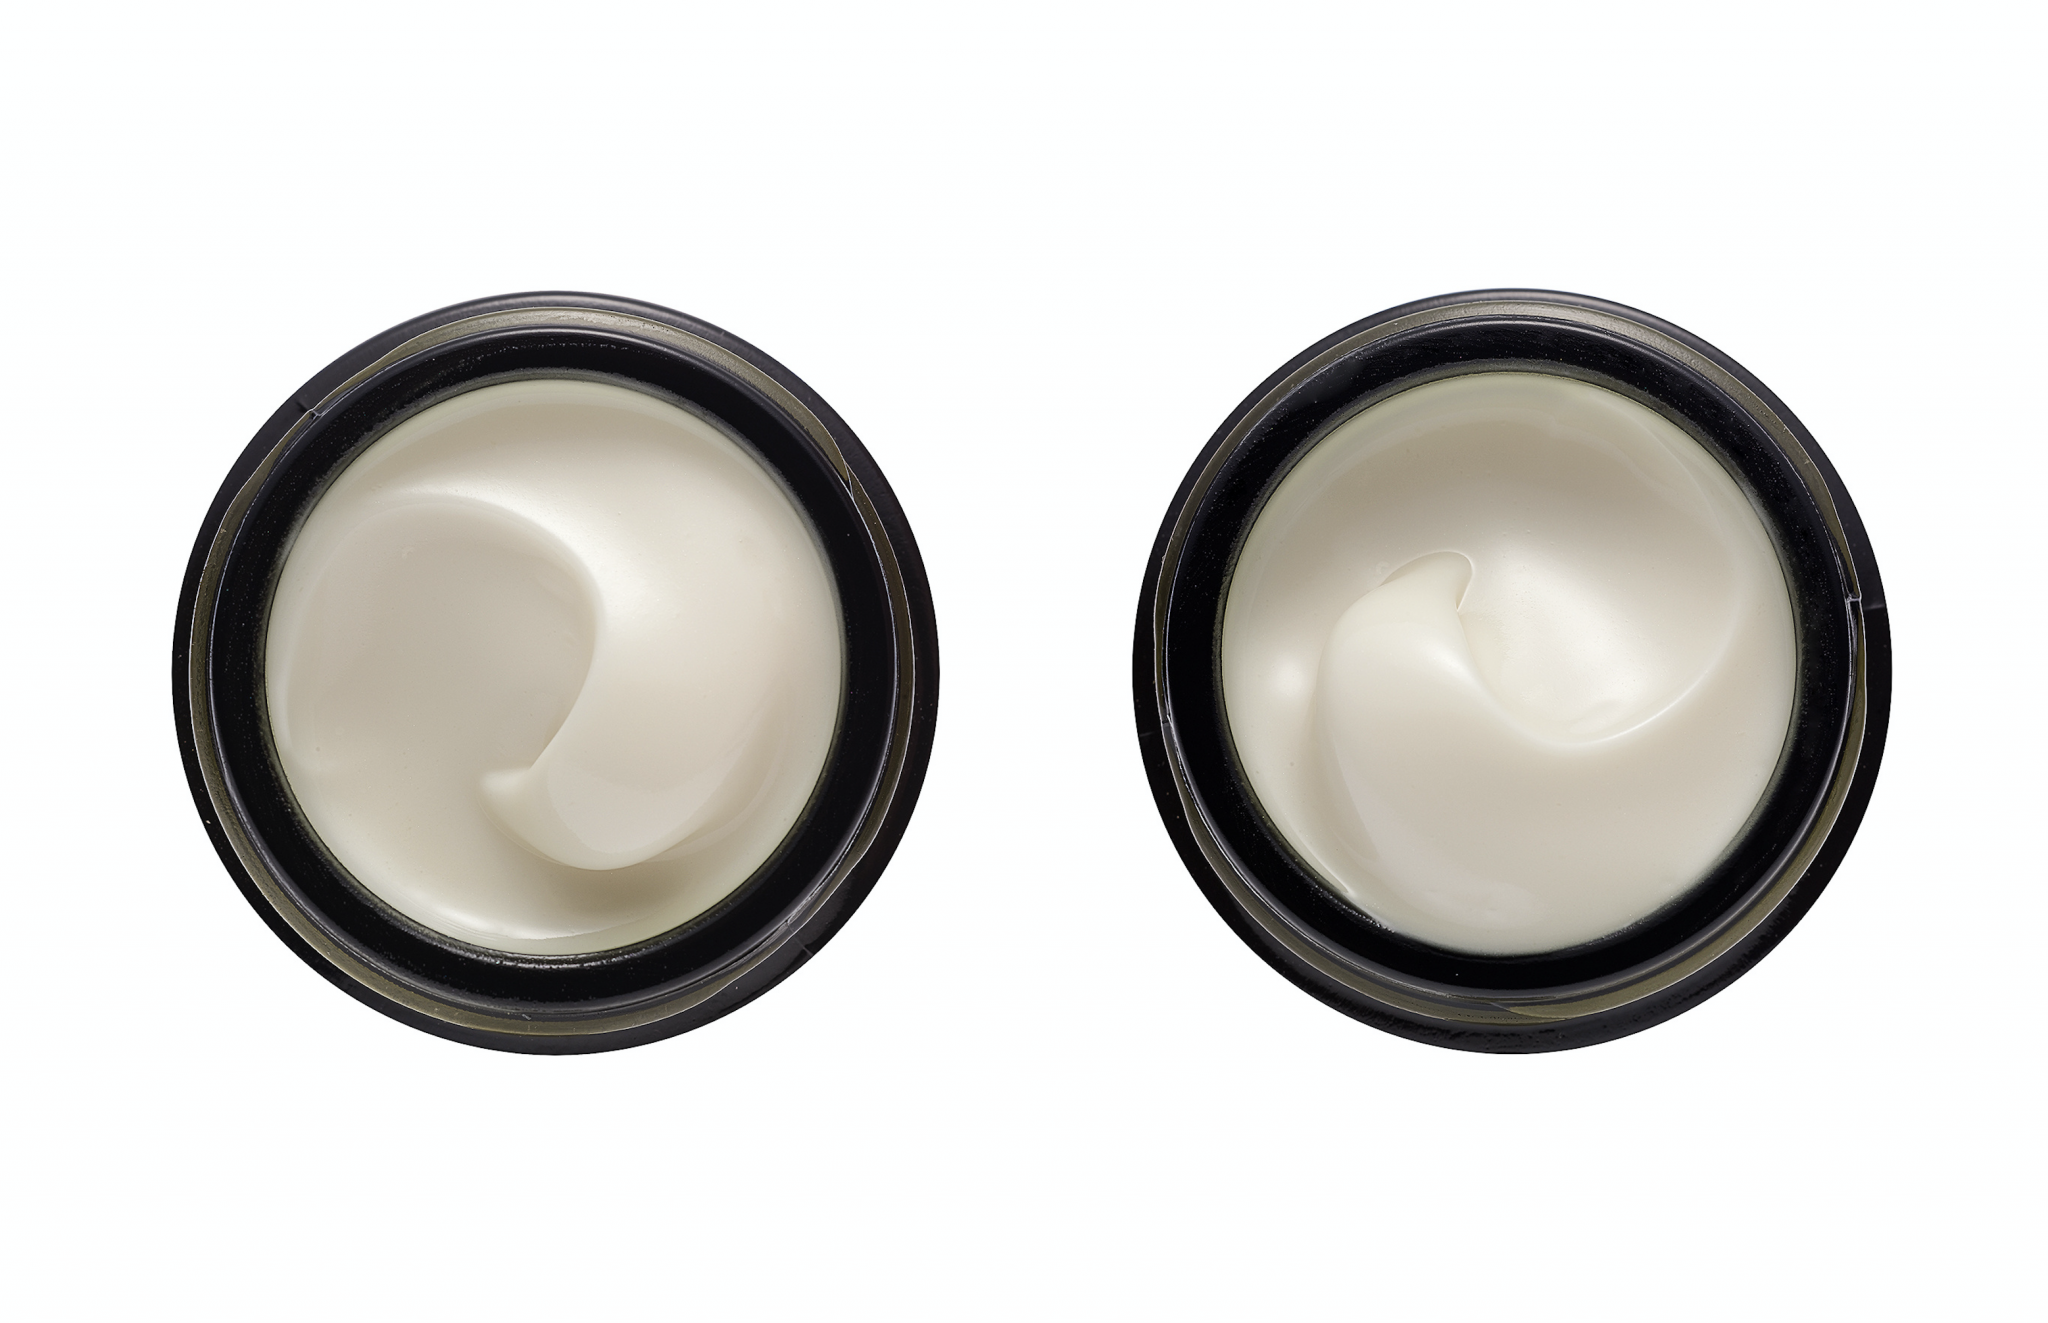 Eye Cream Reviews - The Dermatology Review